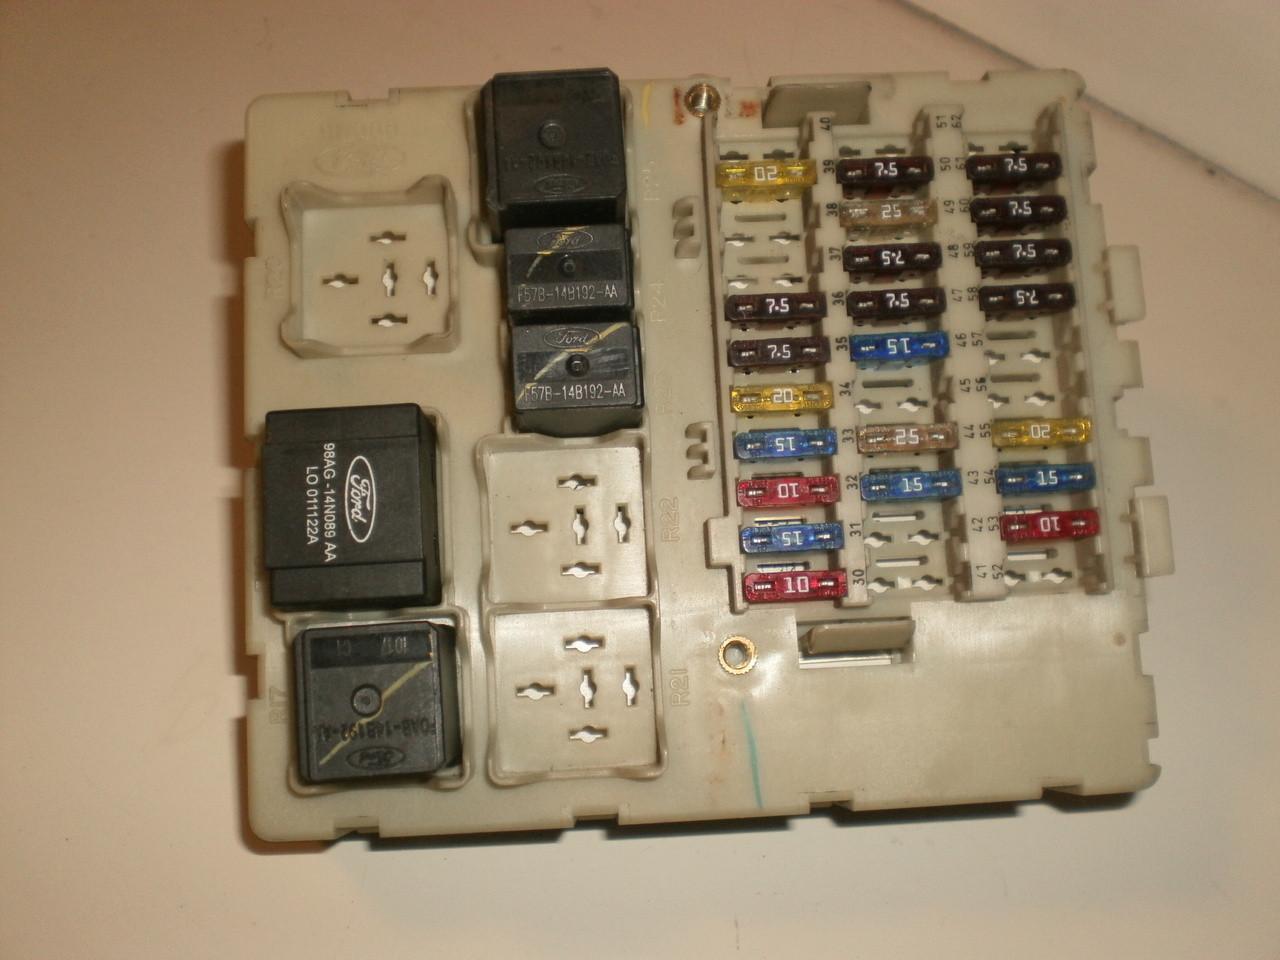 medium resolution of 2008 ford focus fuse panel layout f150 box diagram f250 54l wiring